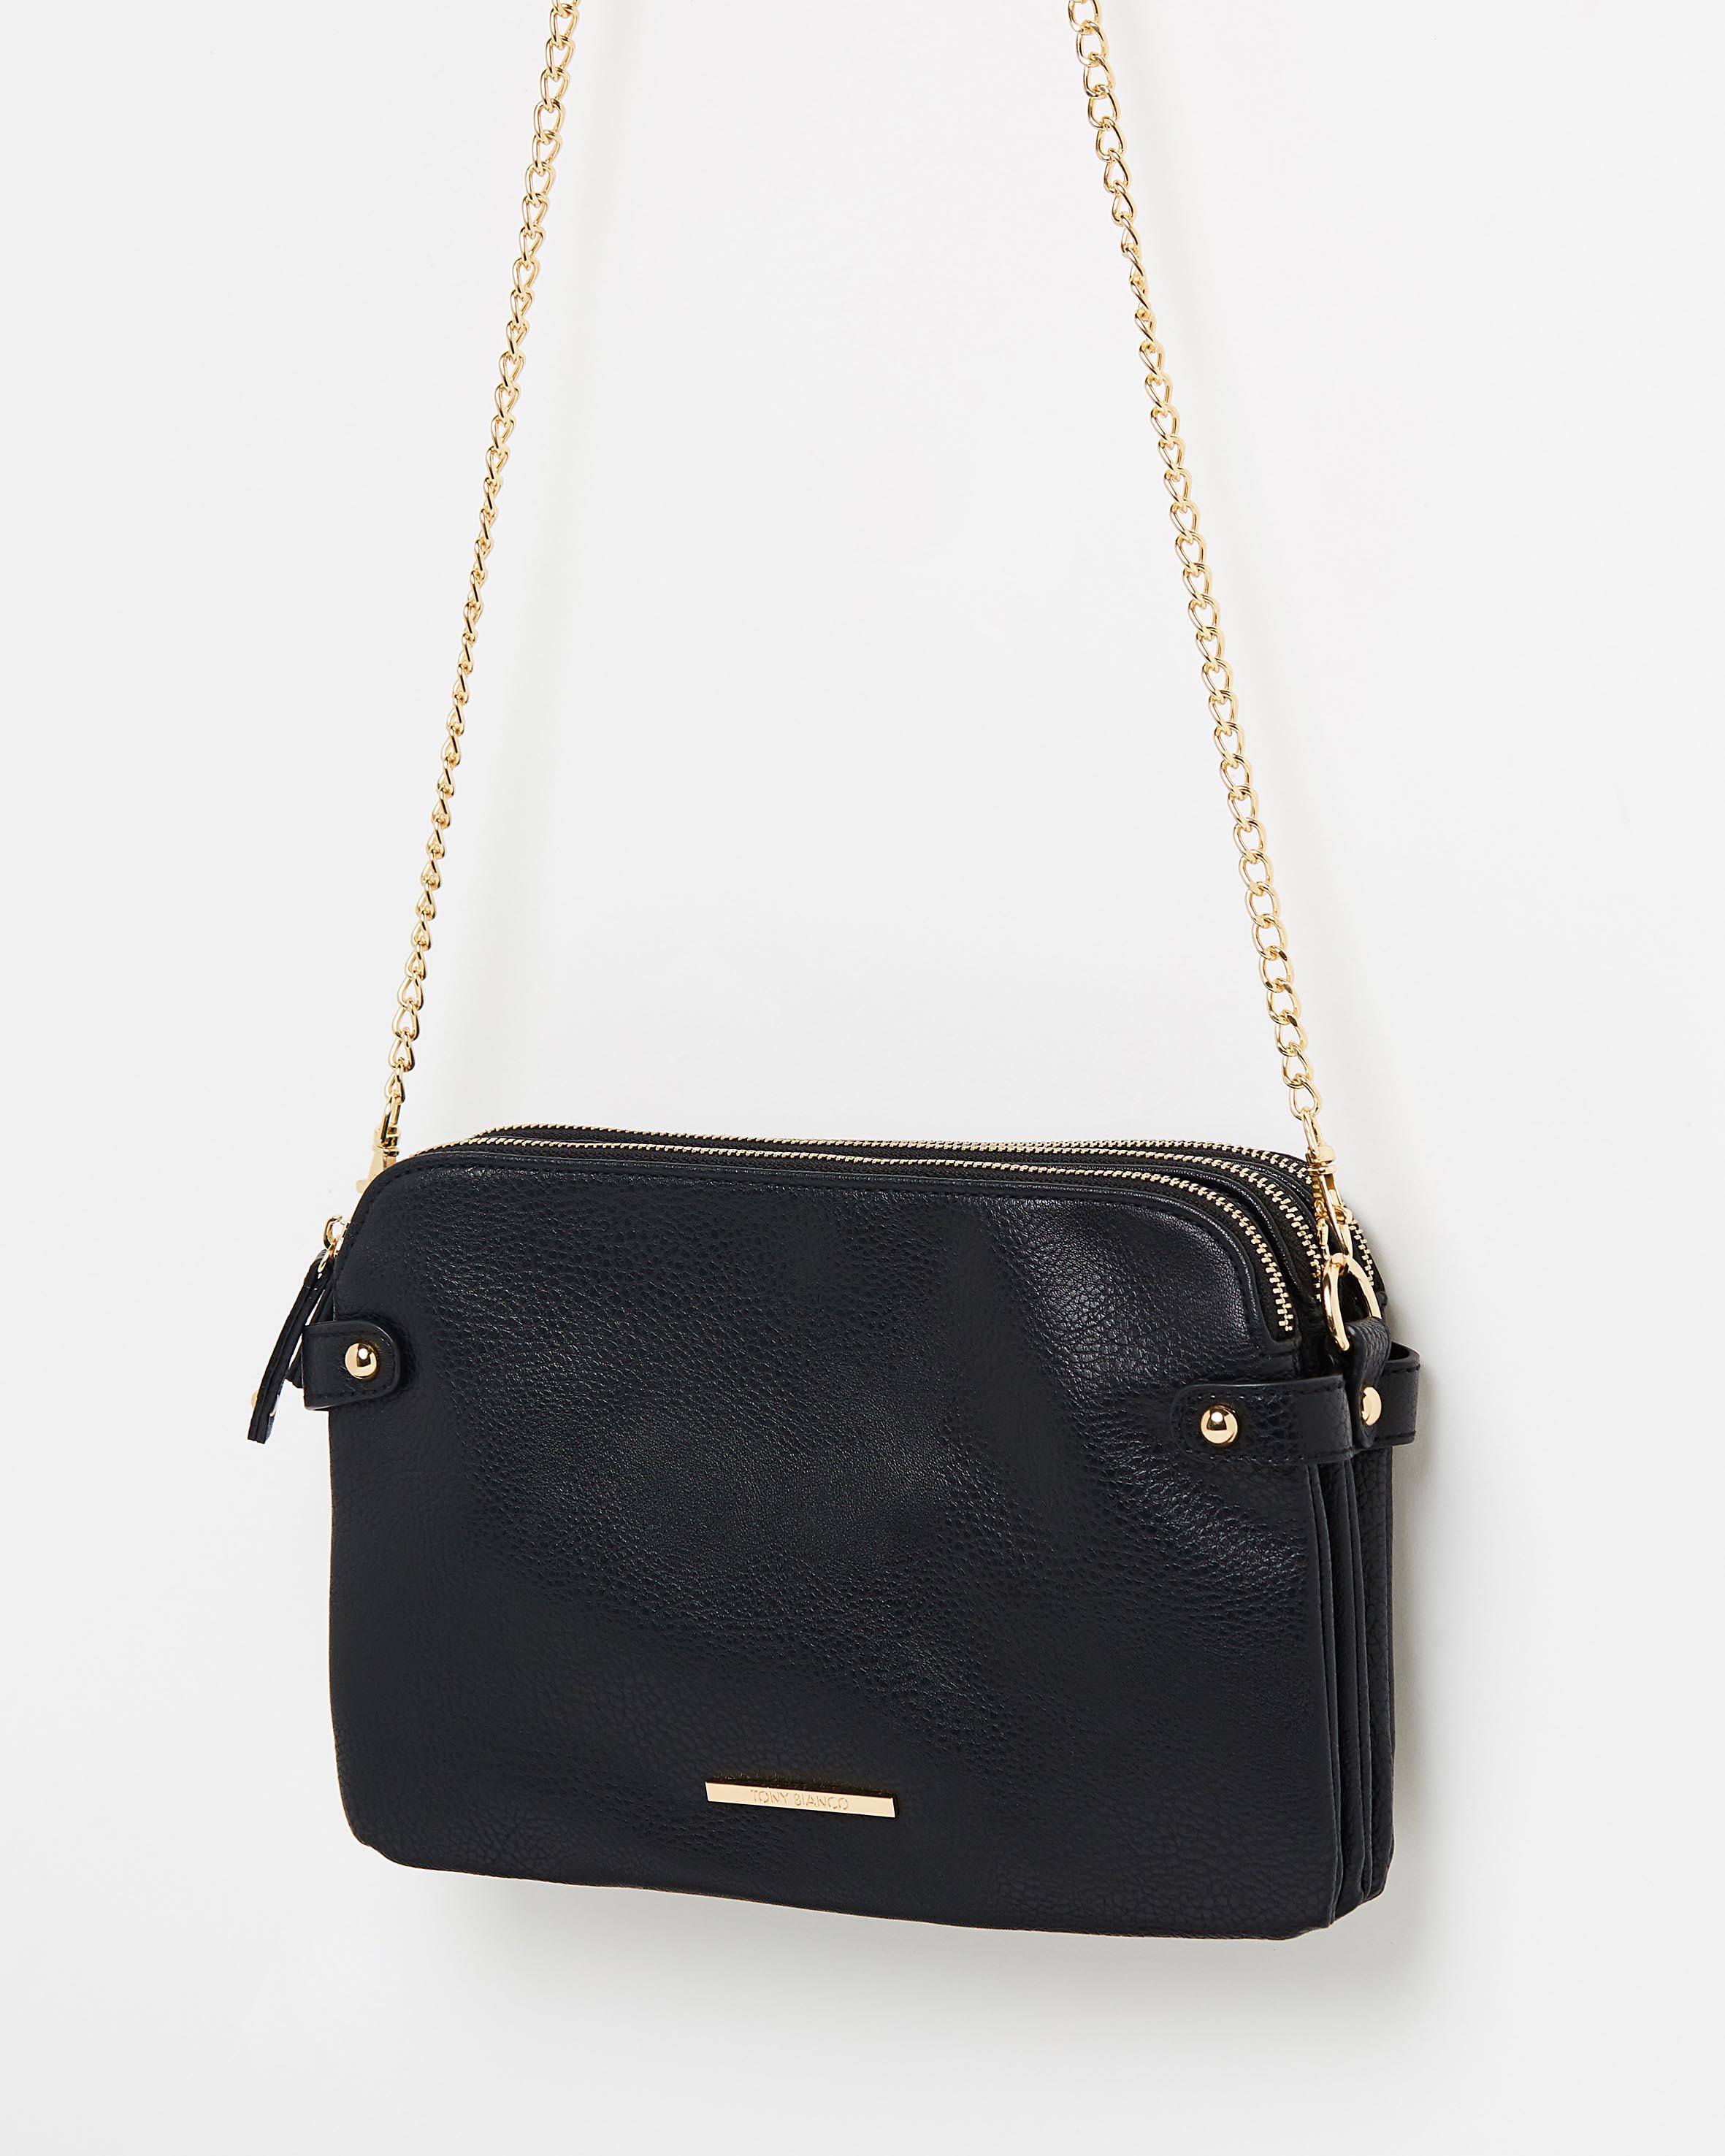 LoveBag LoveBag-Malaysia Online Fashion Bags Blogshop: Charlize Satchel Bag